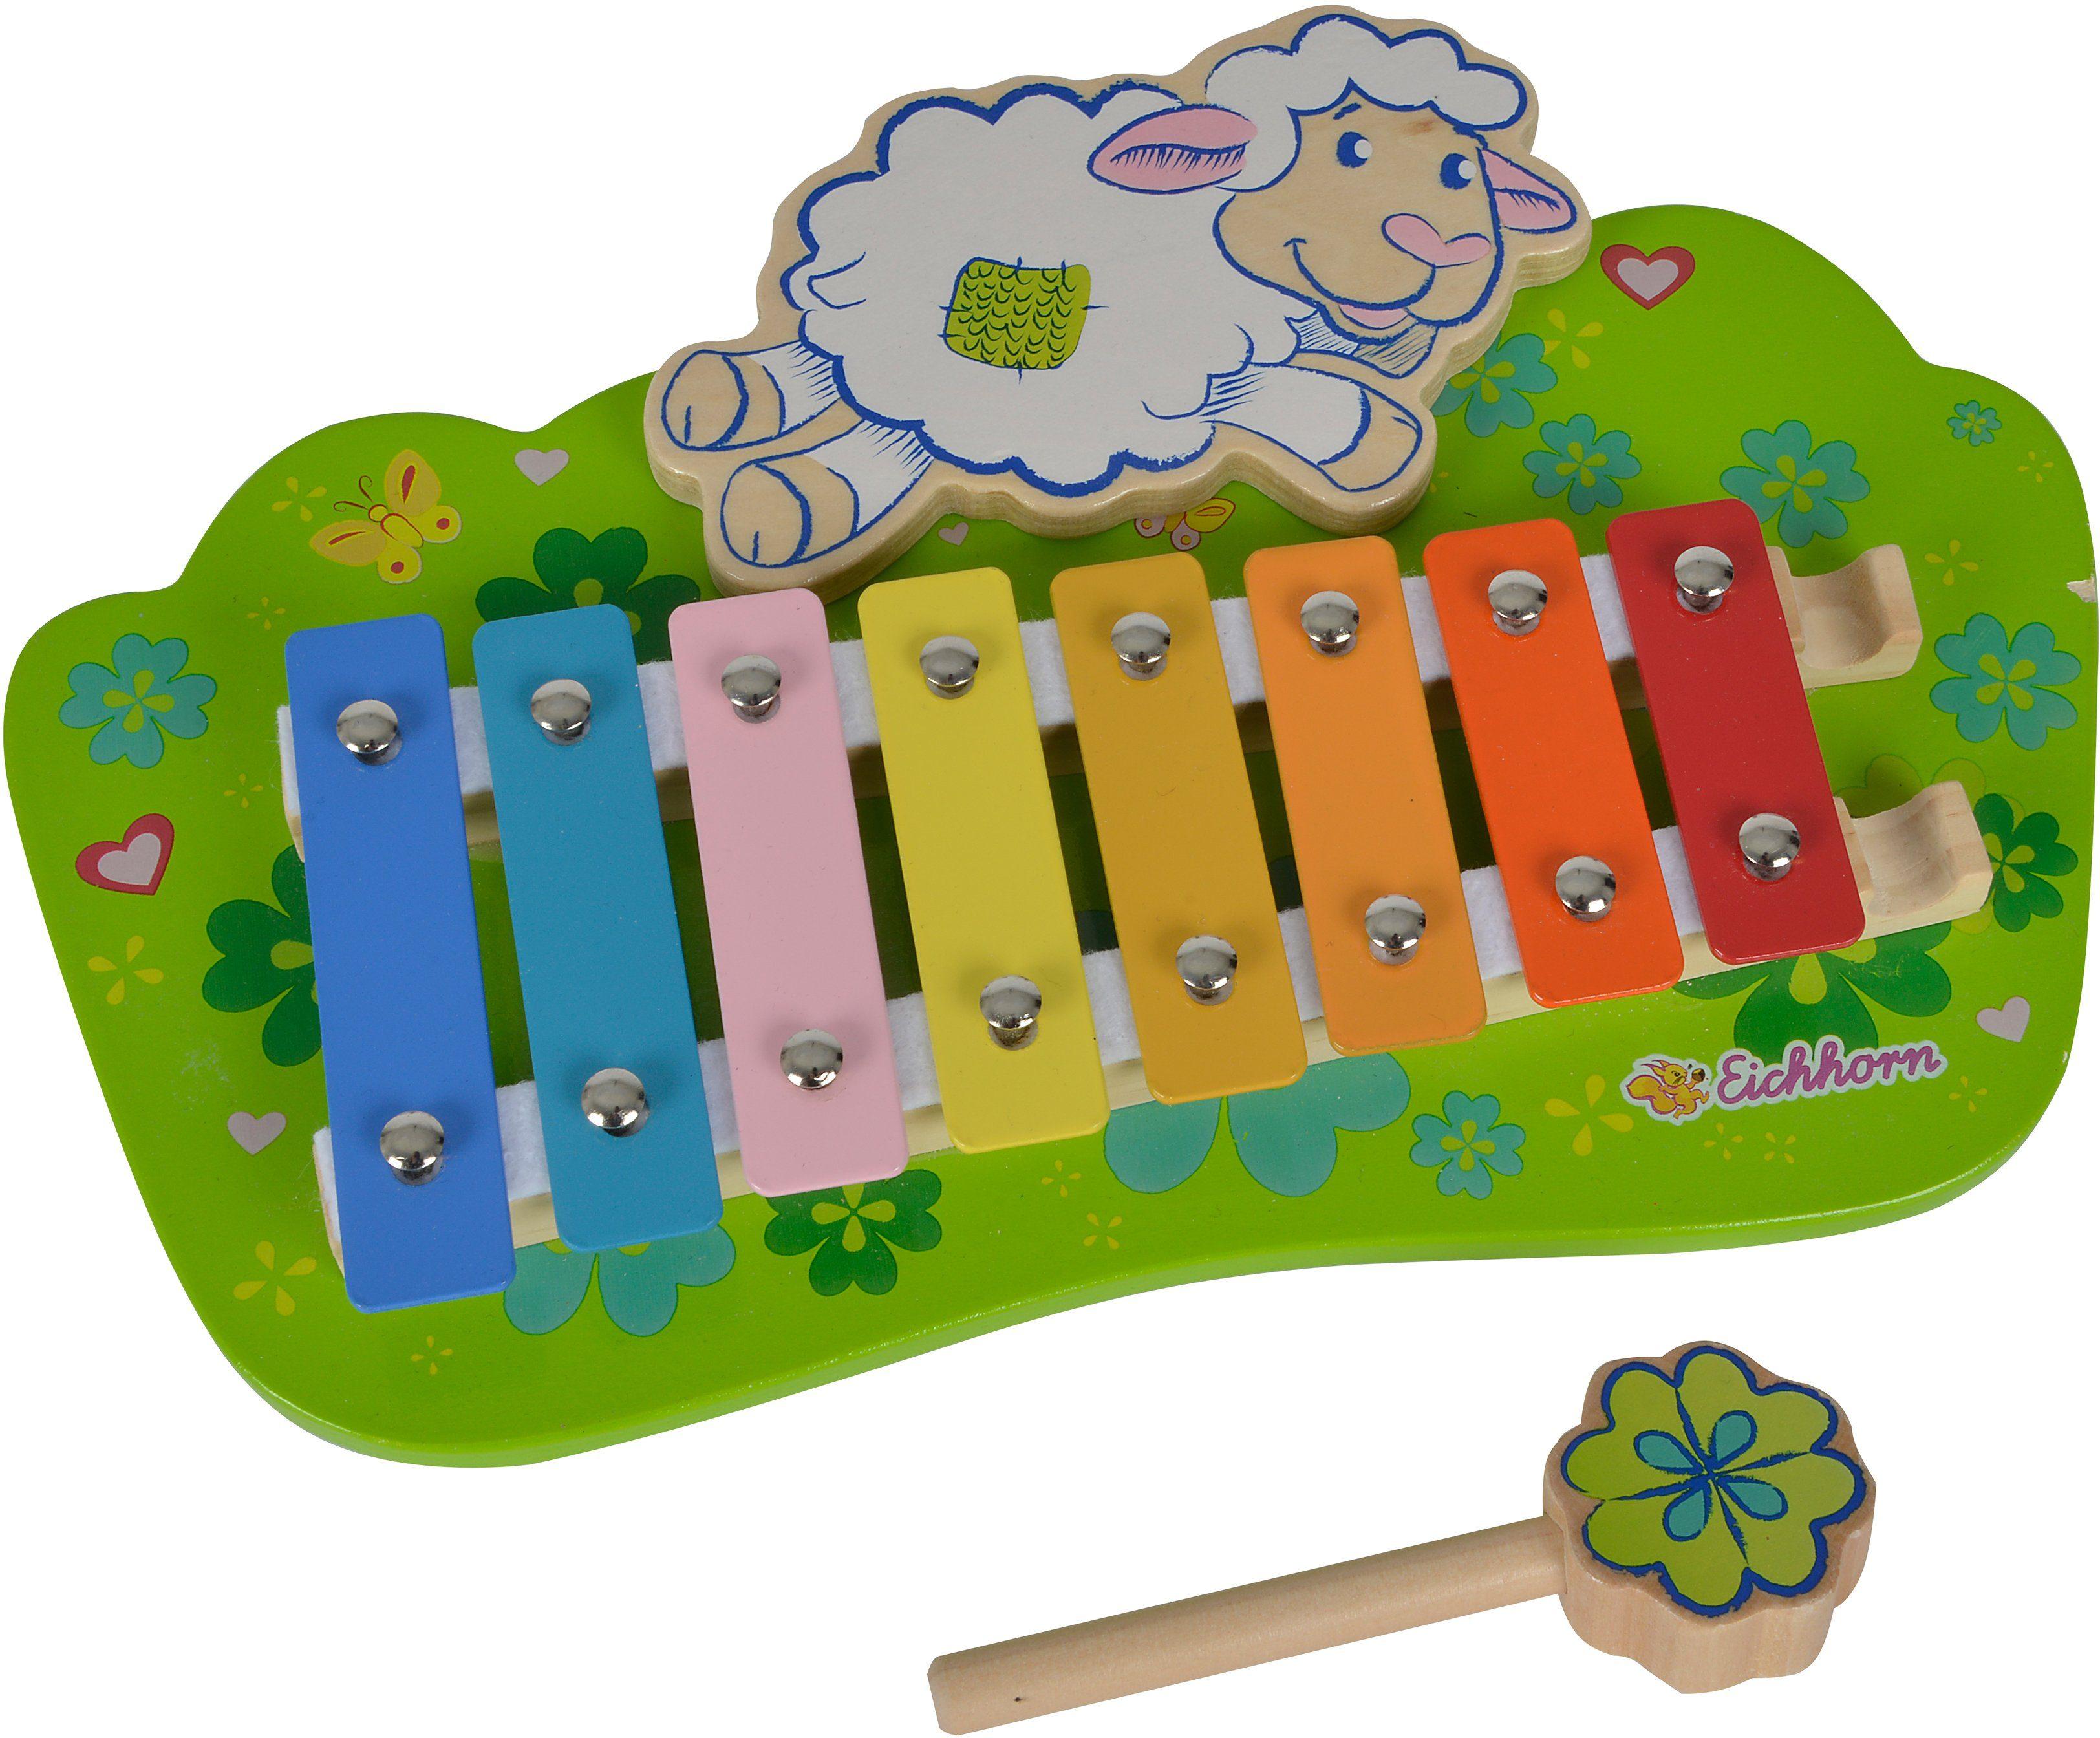 Eichhorn Musikinstrument aus Holz, »Xylophon Schaf«